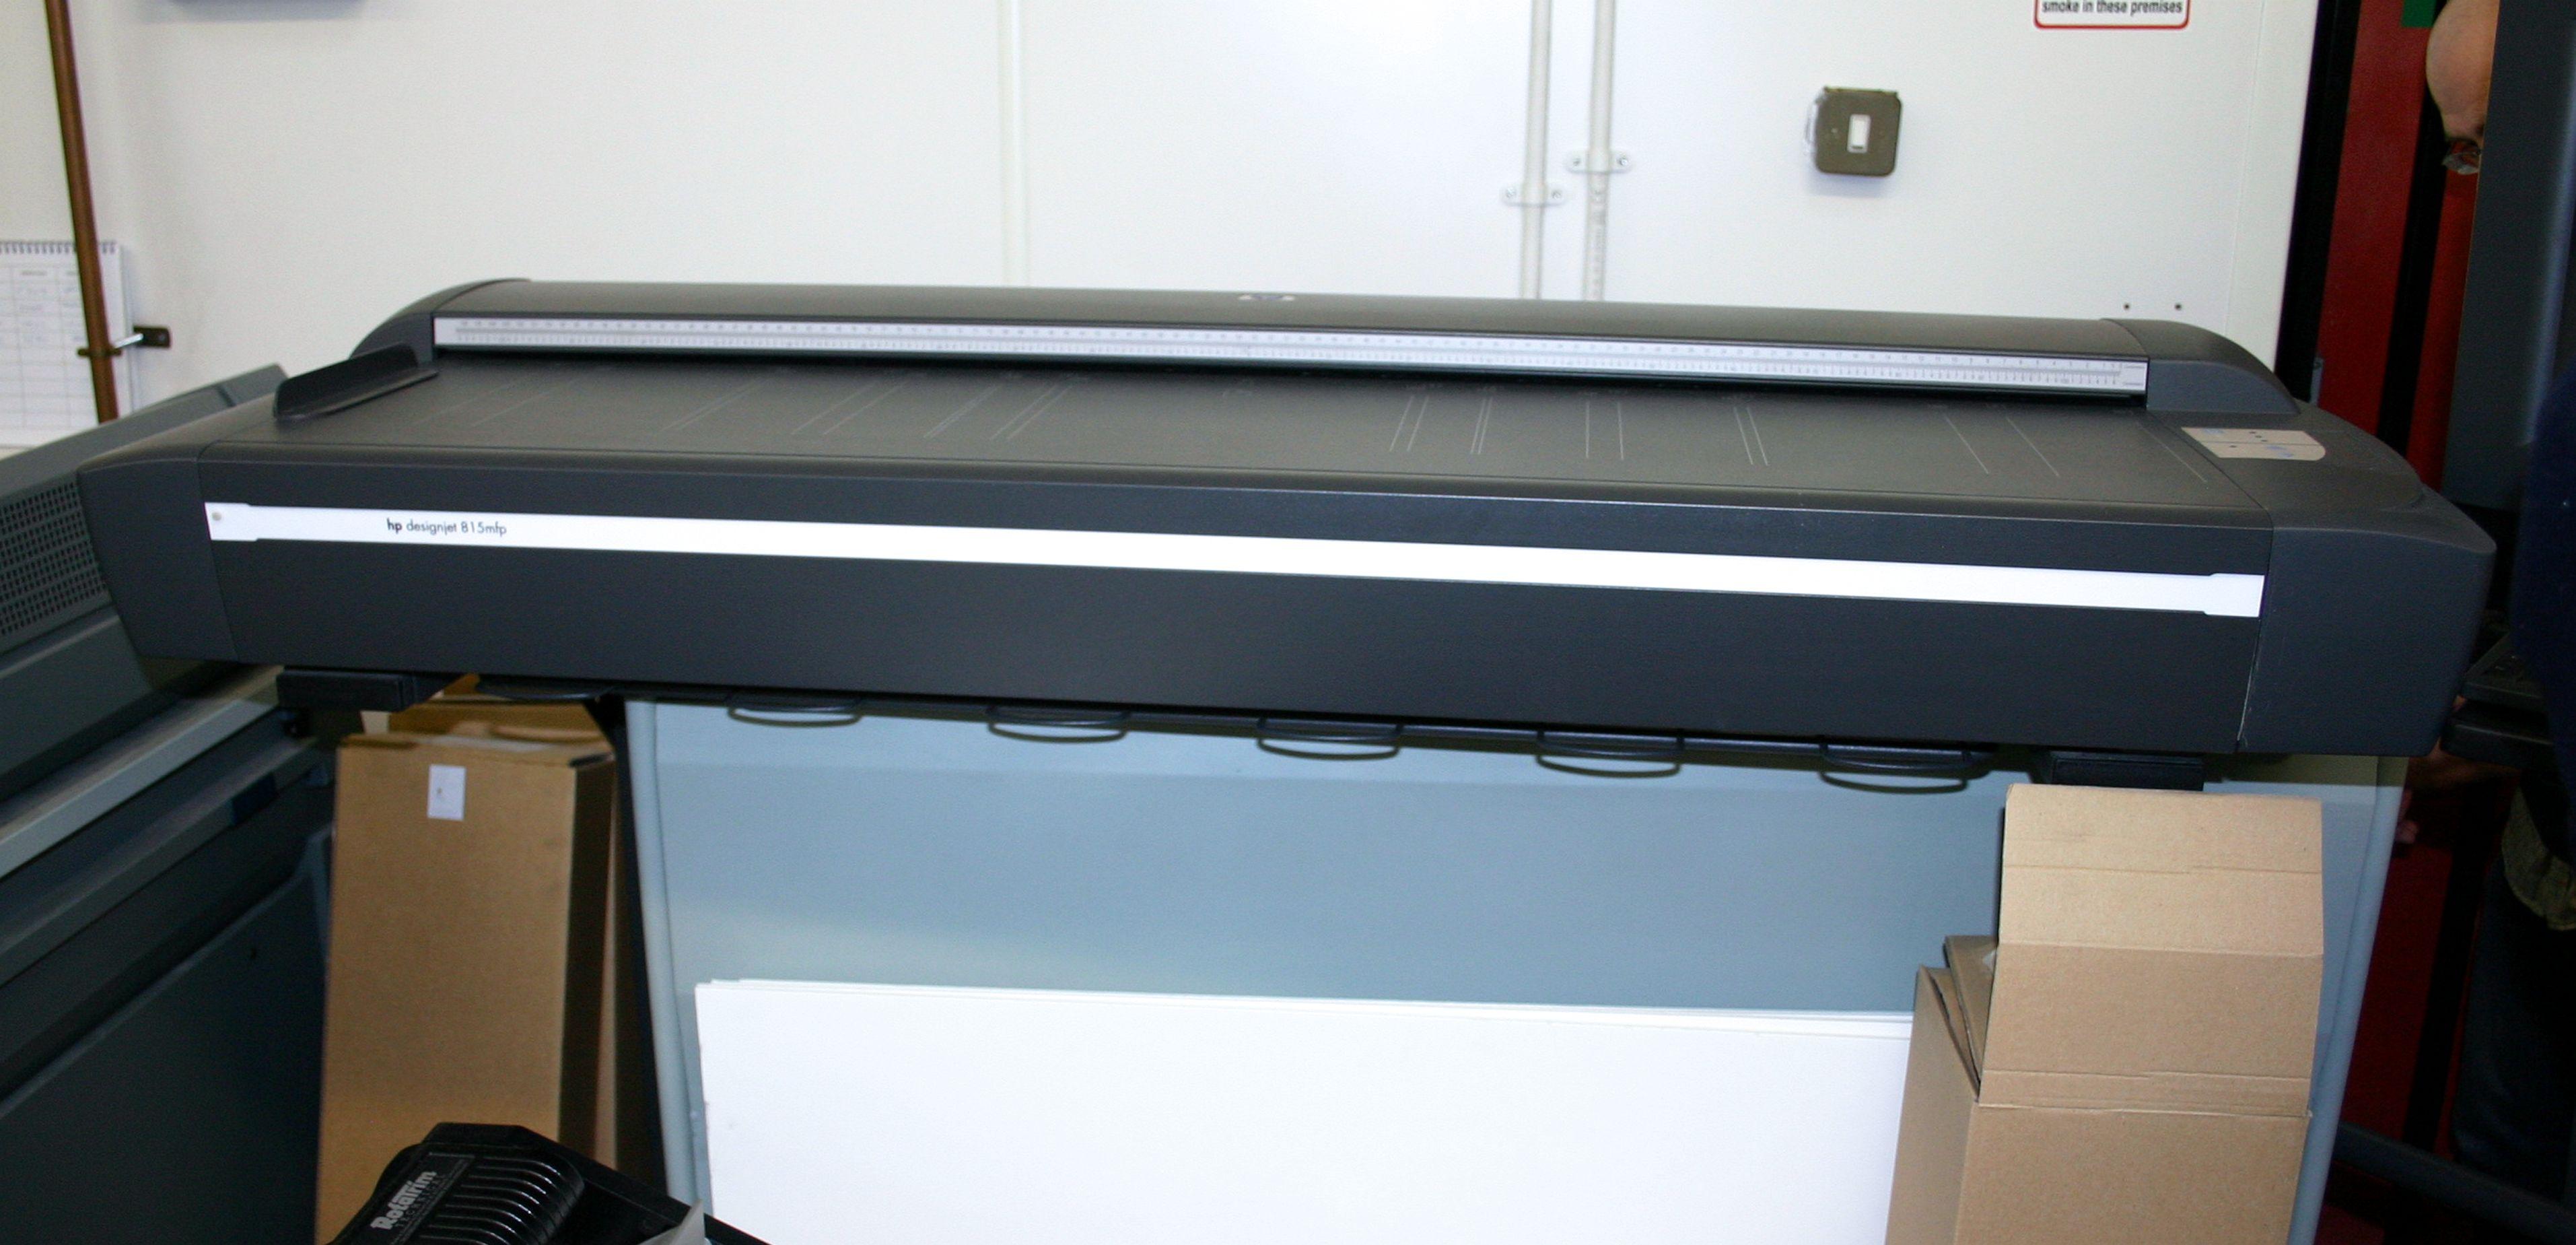 Lp35hs laminator